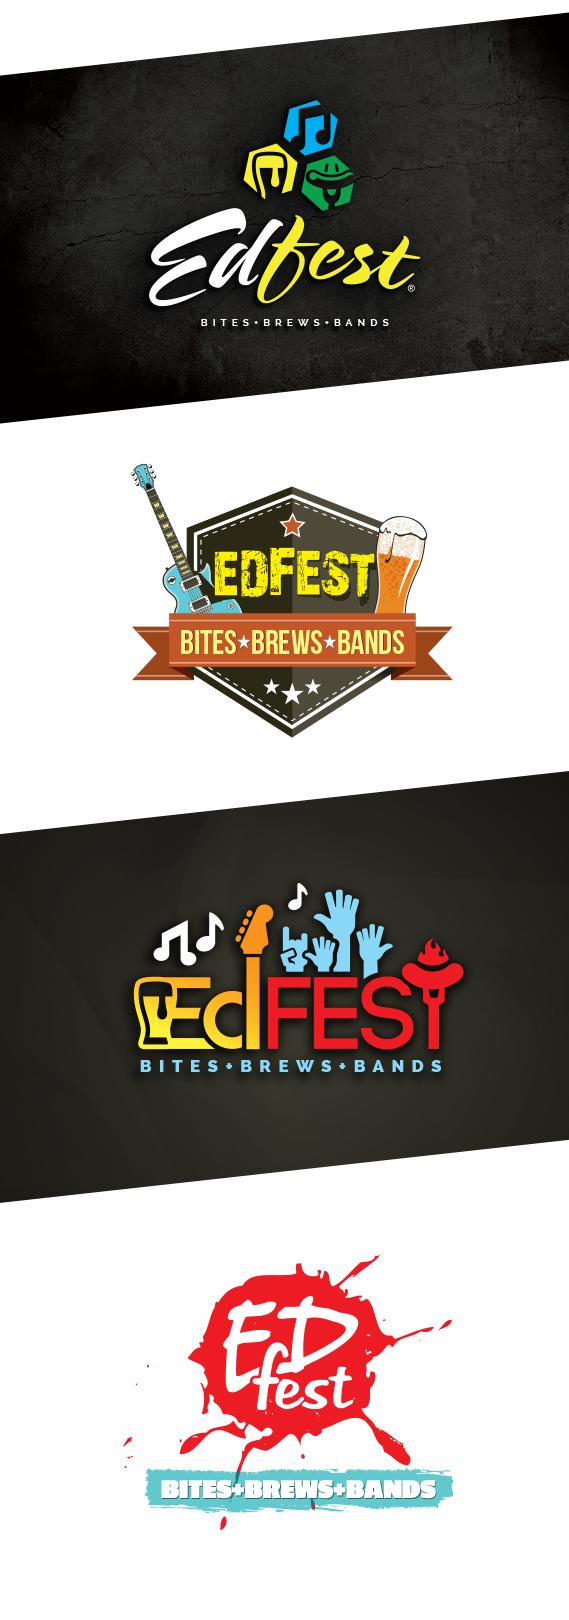 Edfest